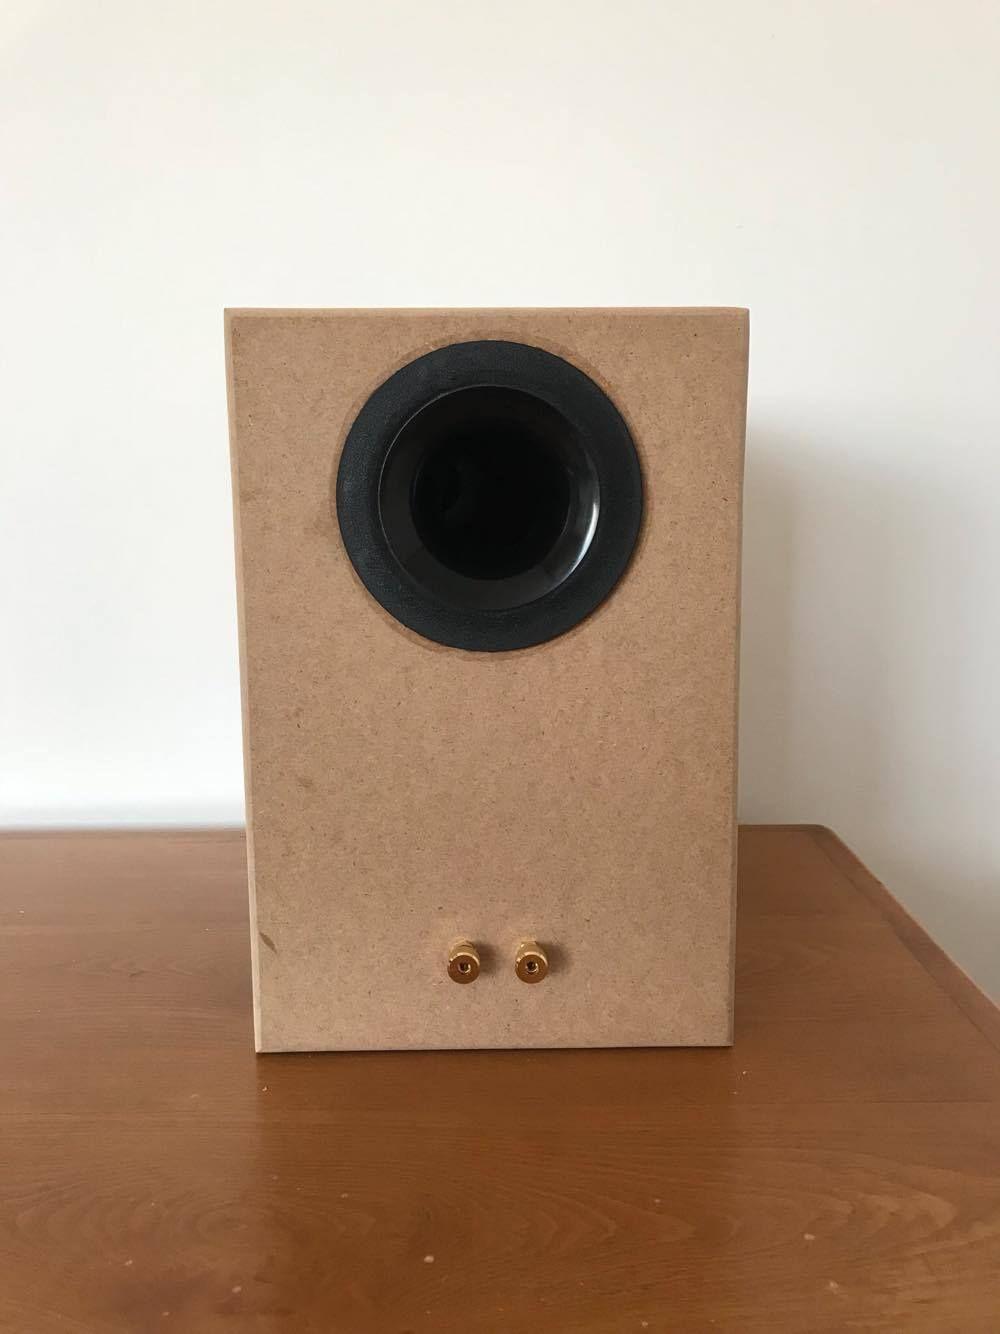 Diy speaker plans 2 way bookshelf kit audio judgement